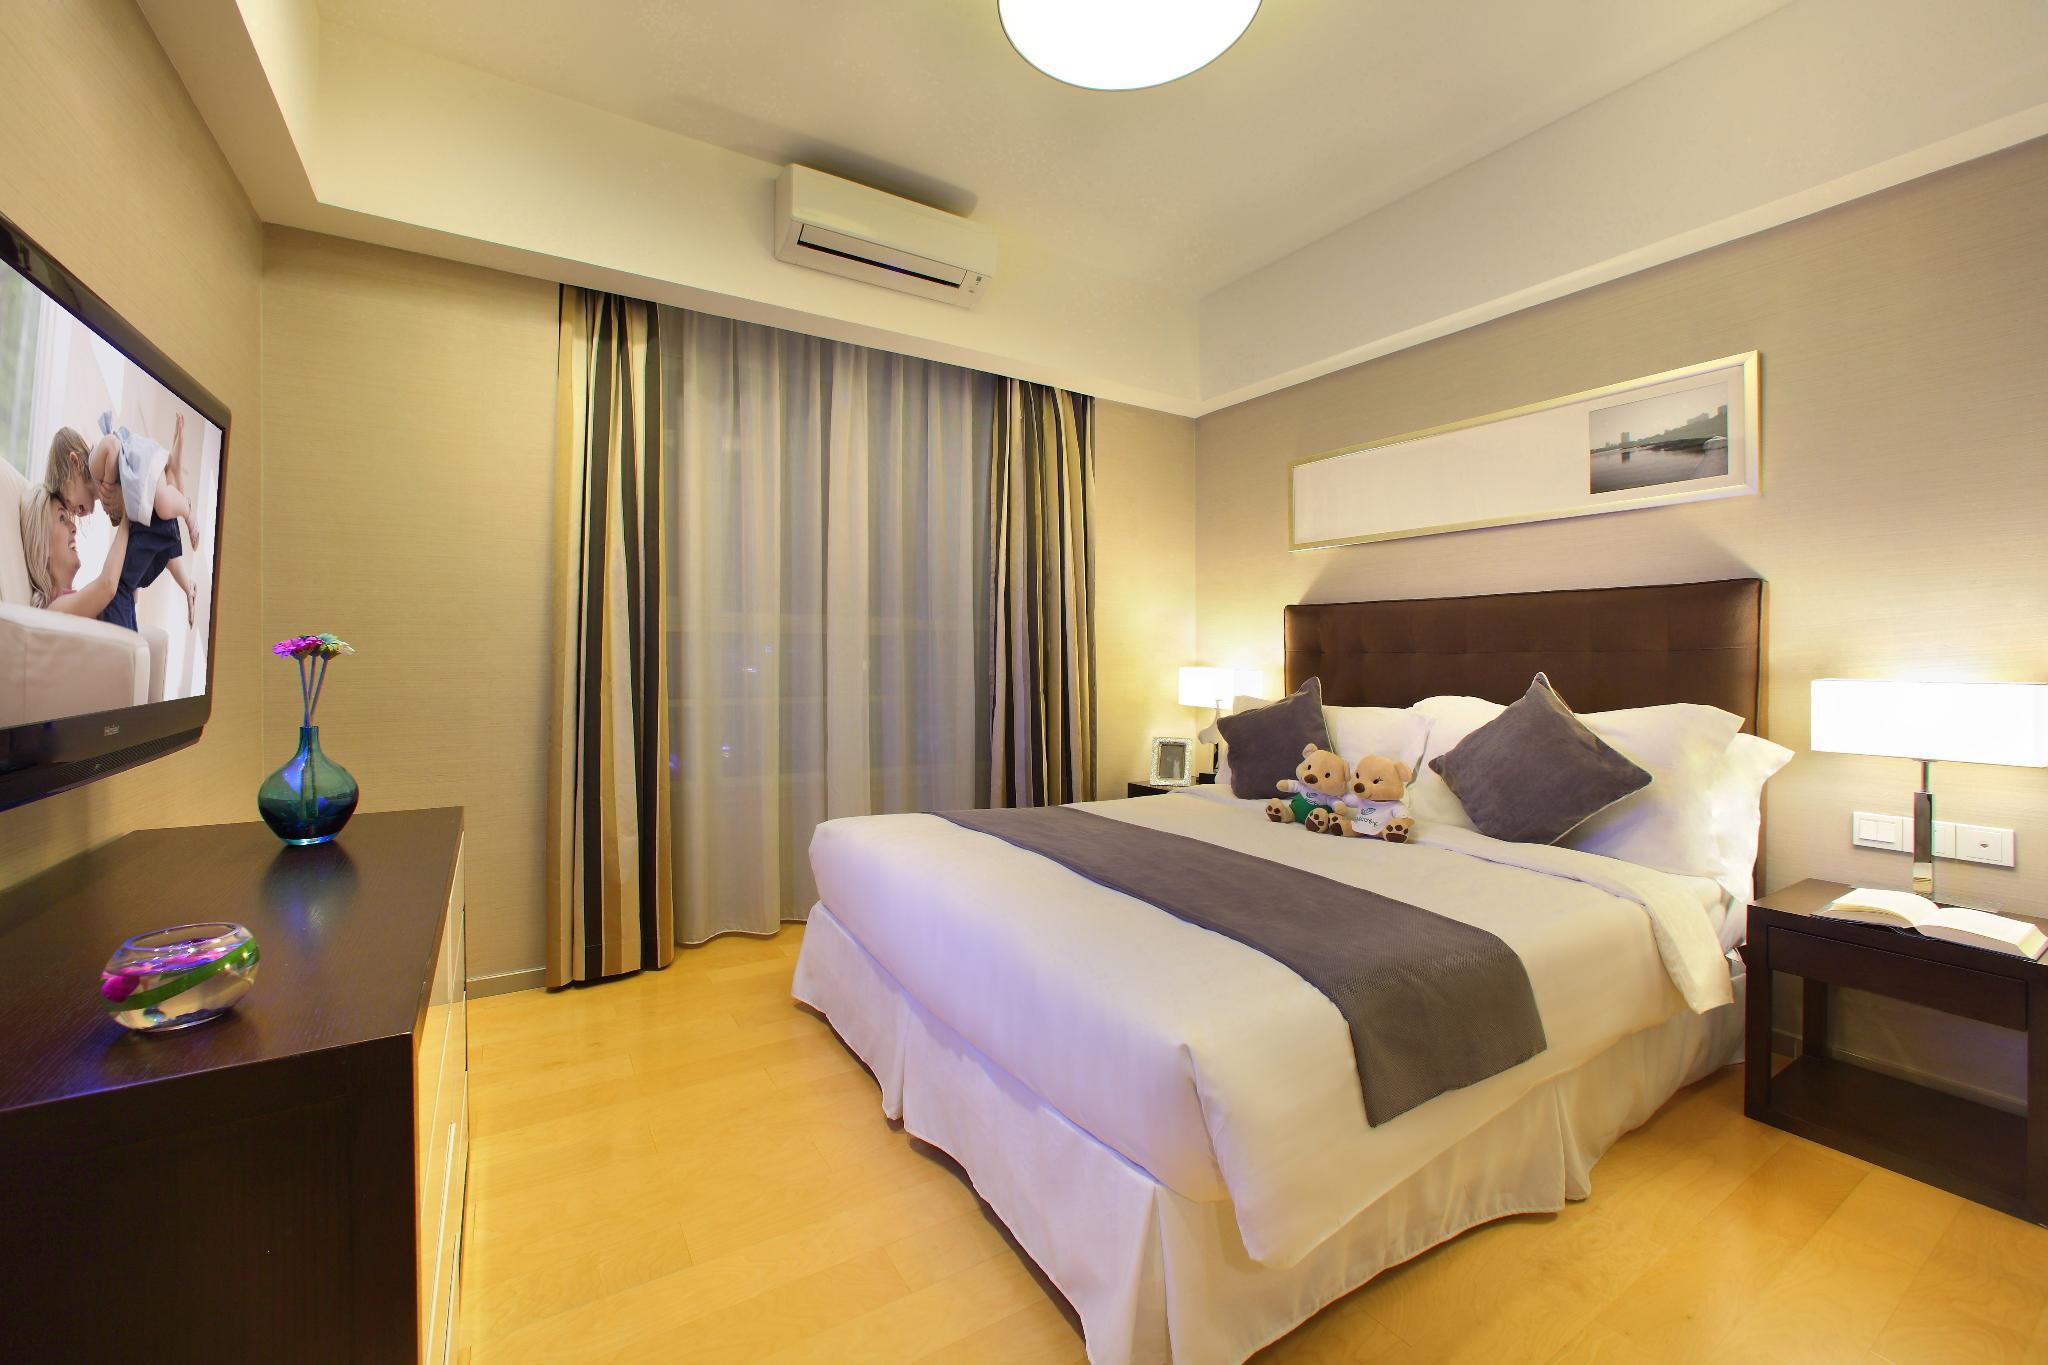 Apartment deluxe two bedroom